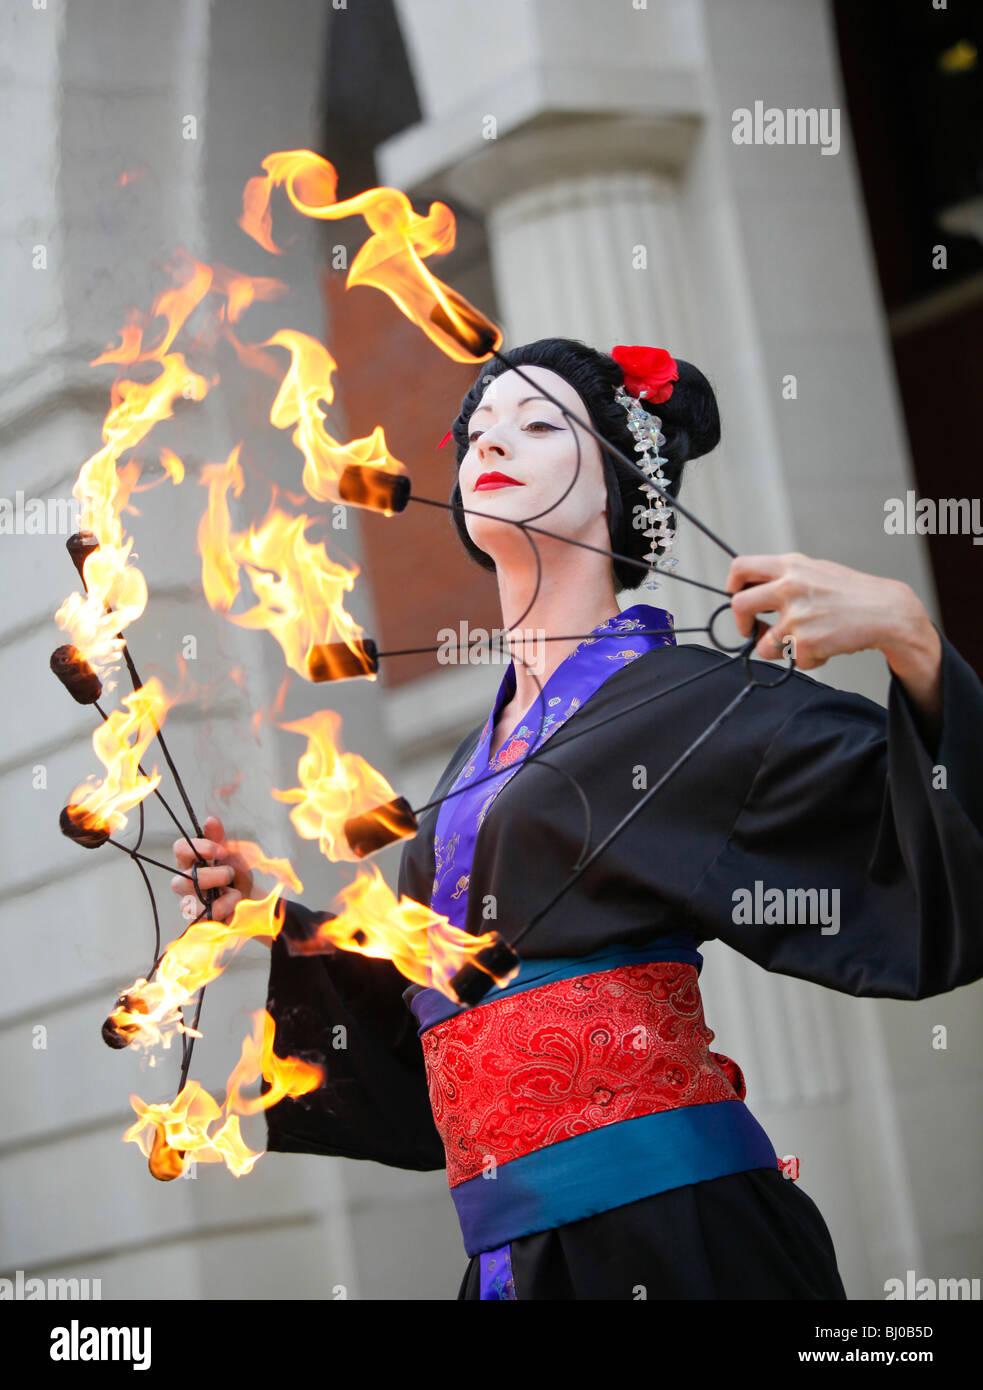 Brindleyplace fire eater, Birmingham, West Midlands. - Stock Image